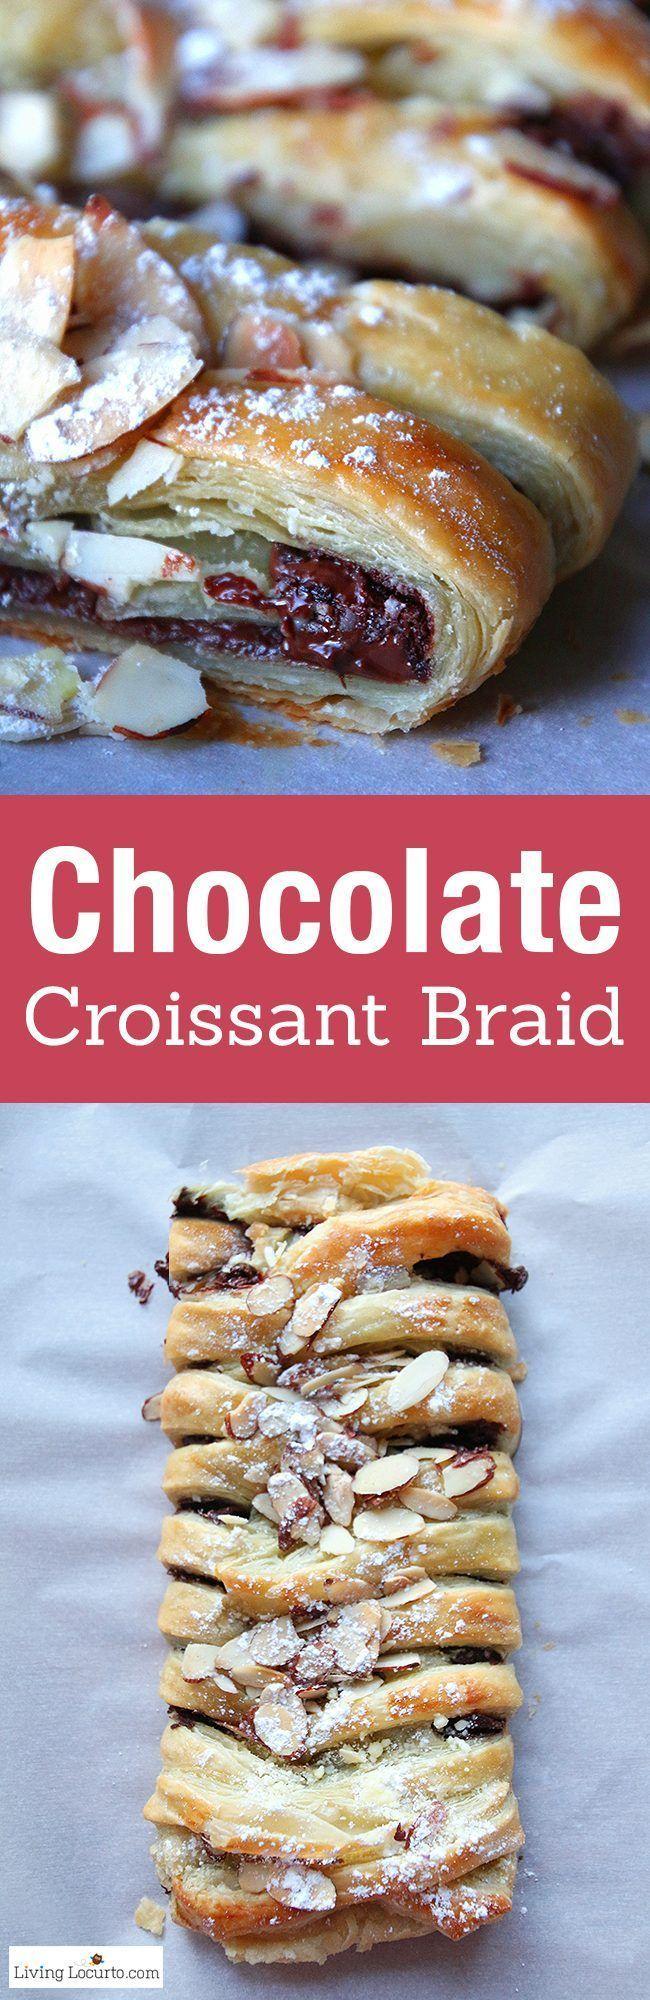 Best 25+ Croissants ideas on Pinterest | Croissant recipe ...